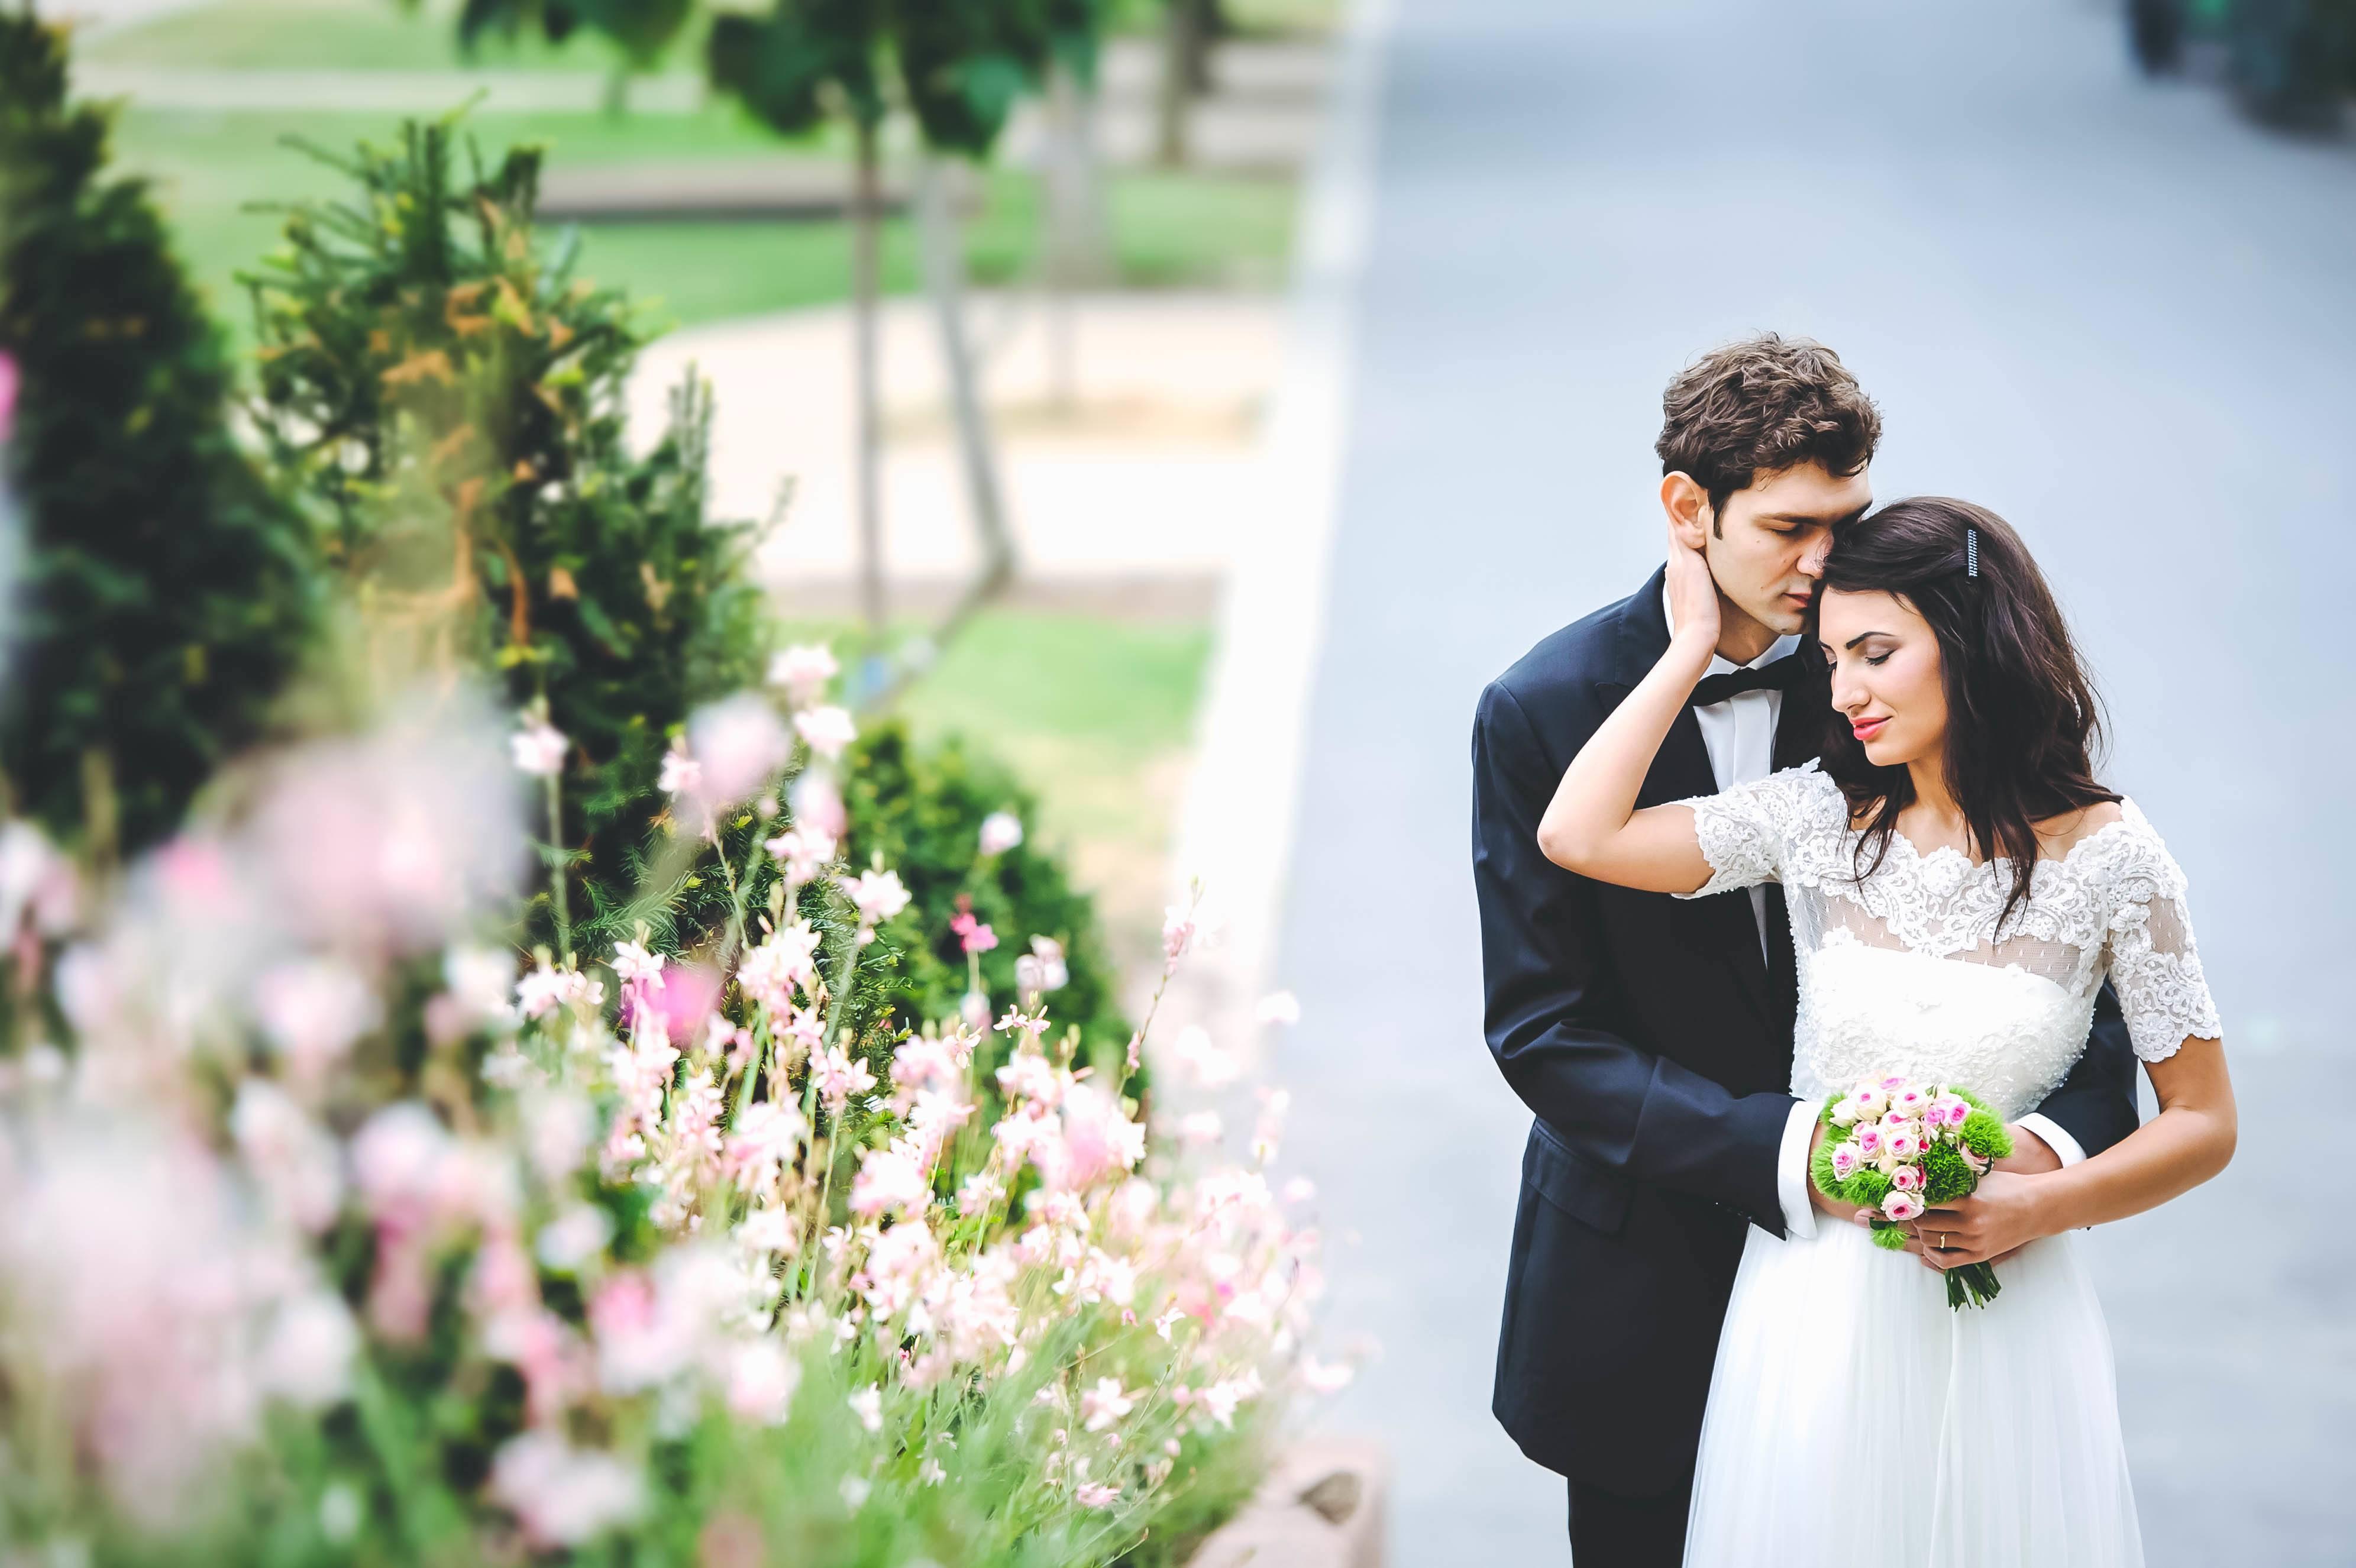 lightroom-presets-for-wedding-photo-retouching-sample